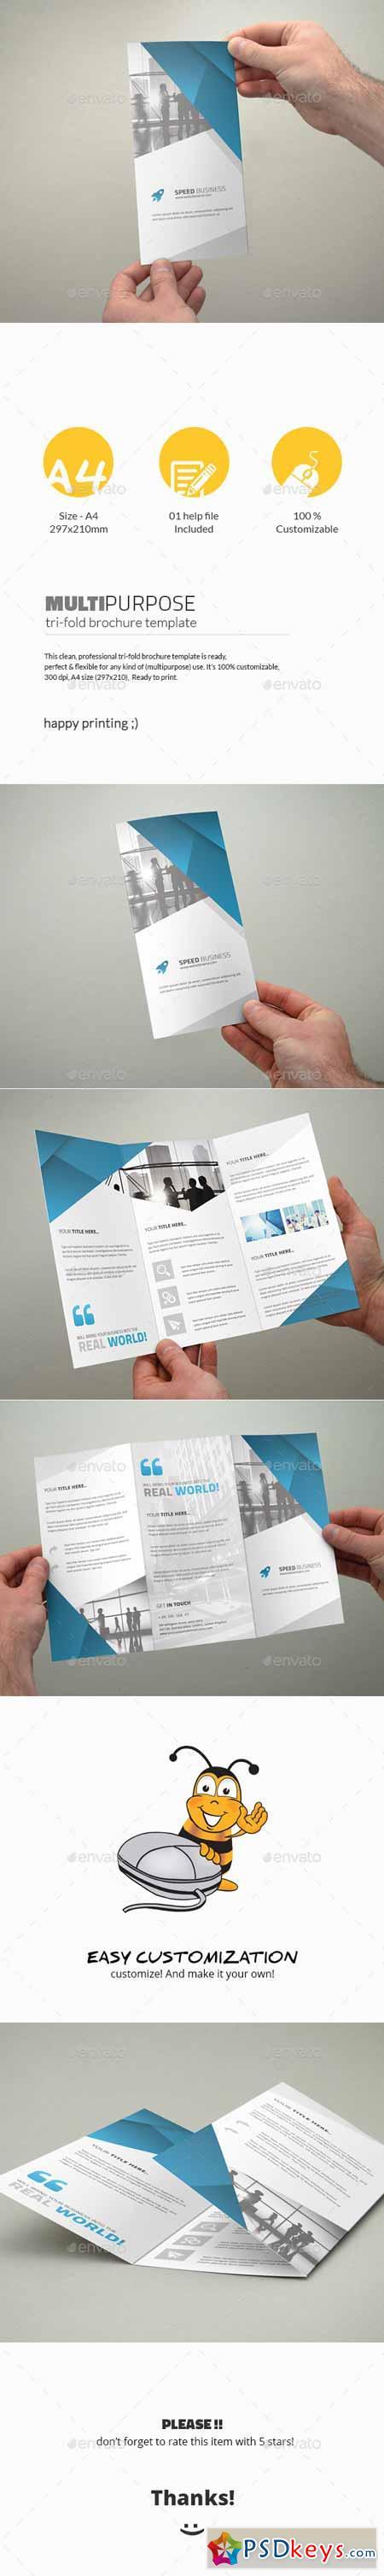 Tri-Fold Brochure - Multipurpose 11390783